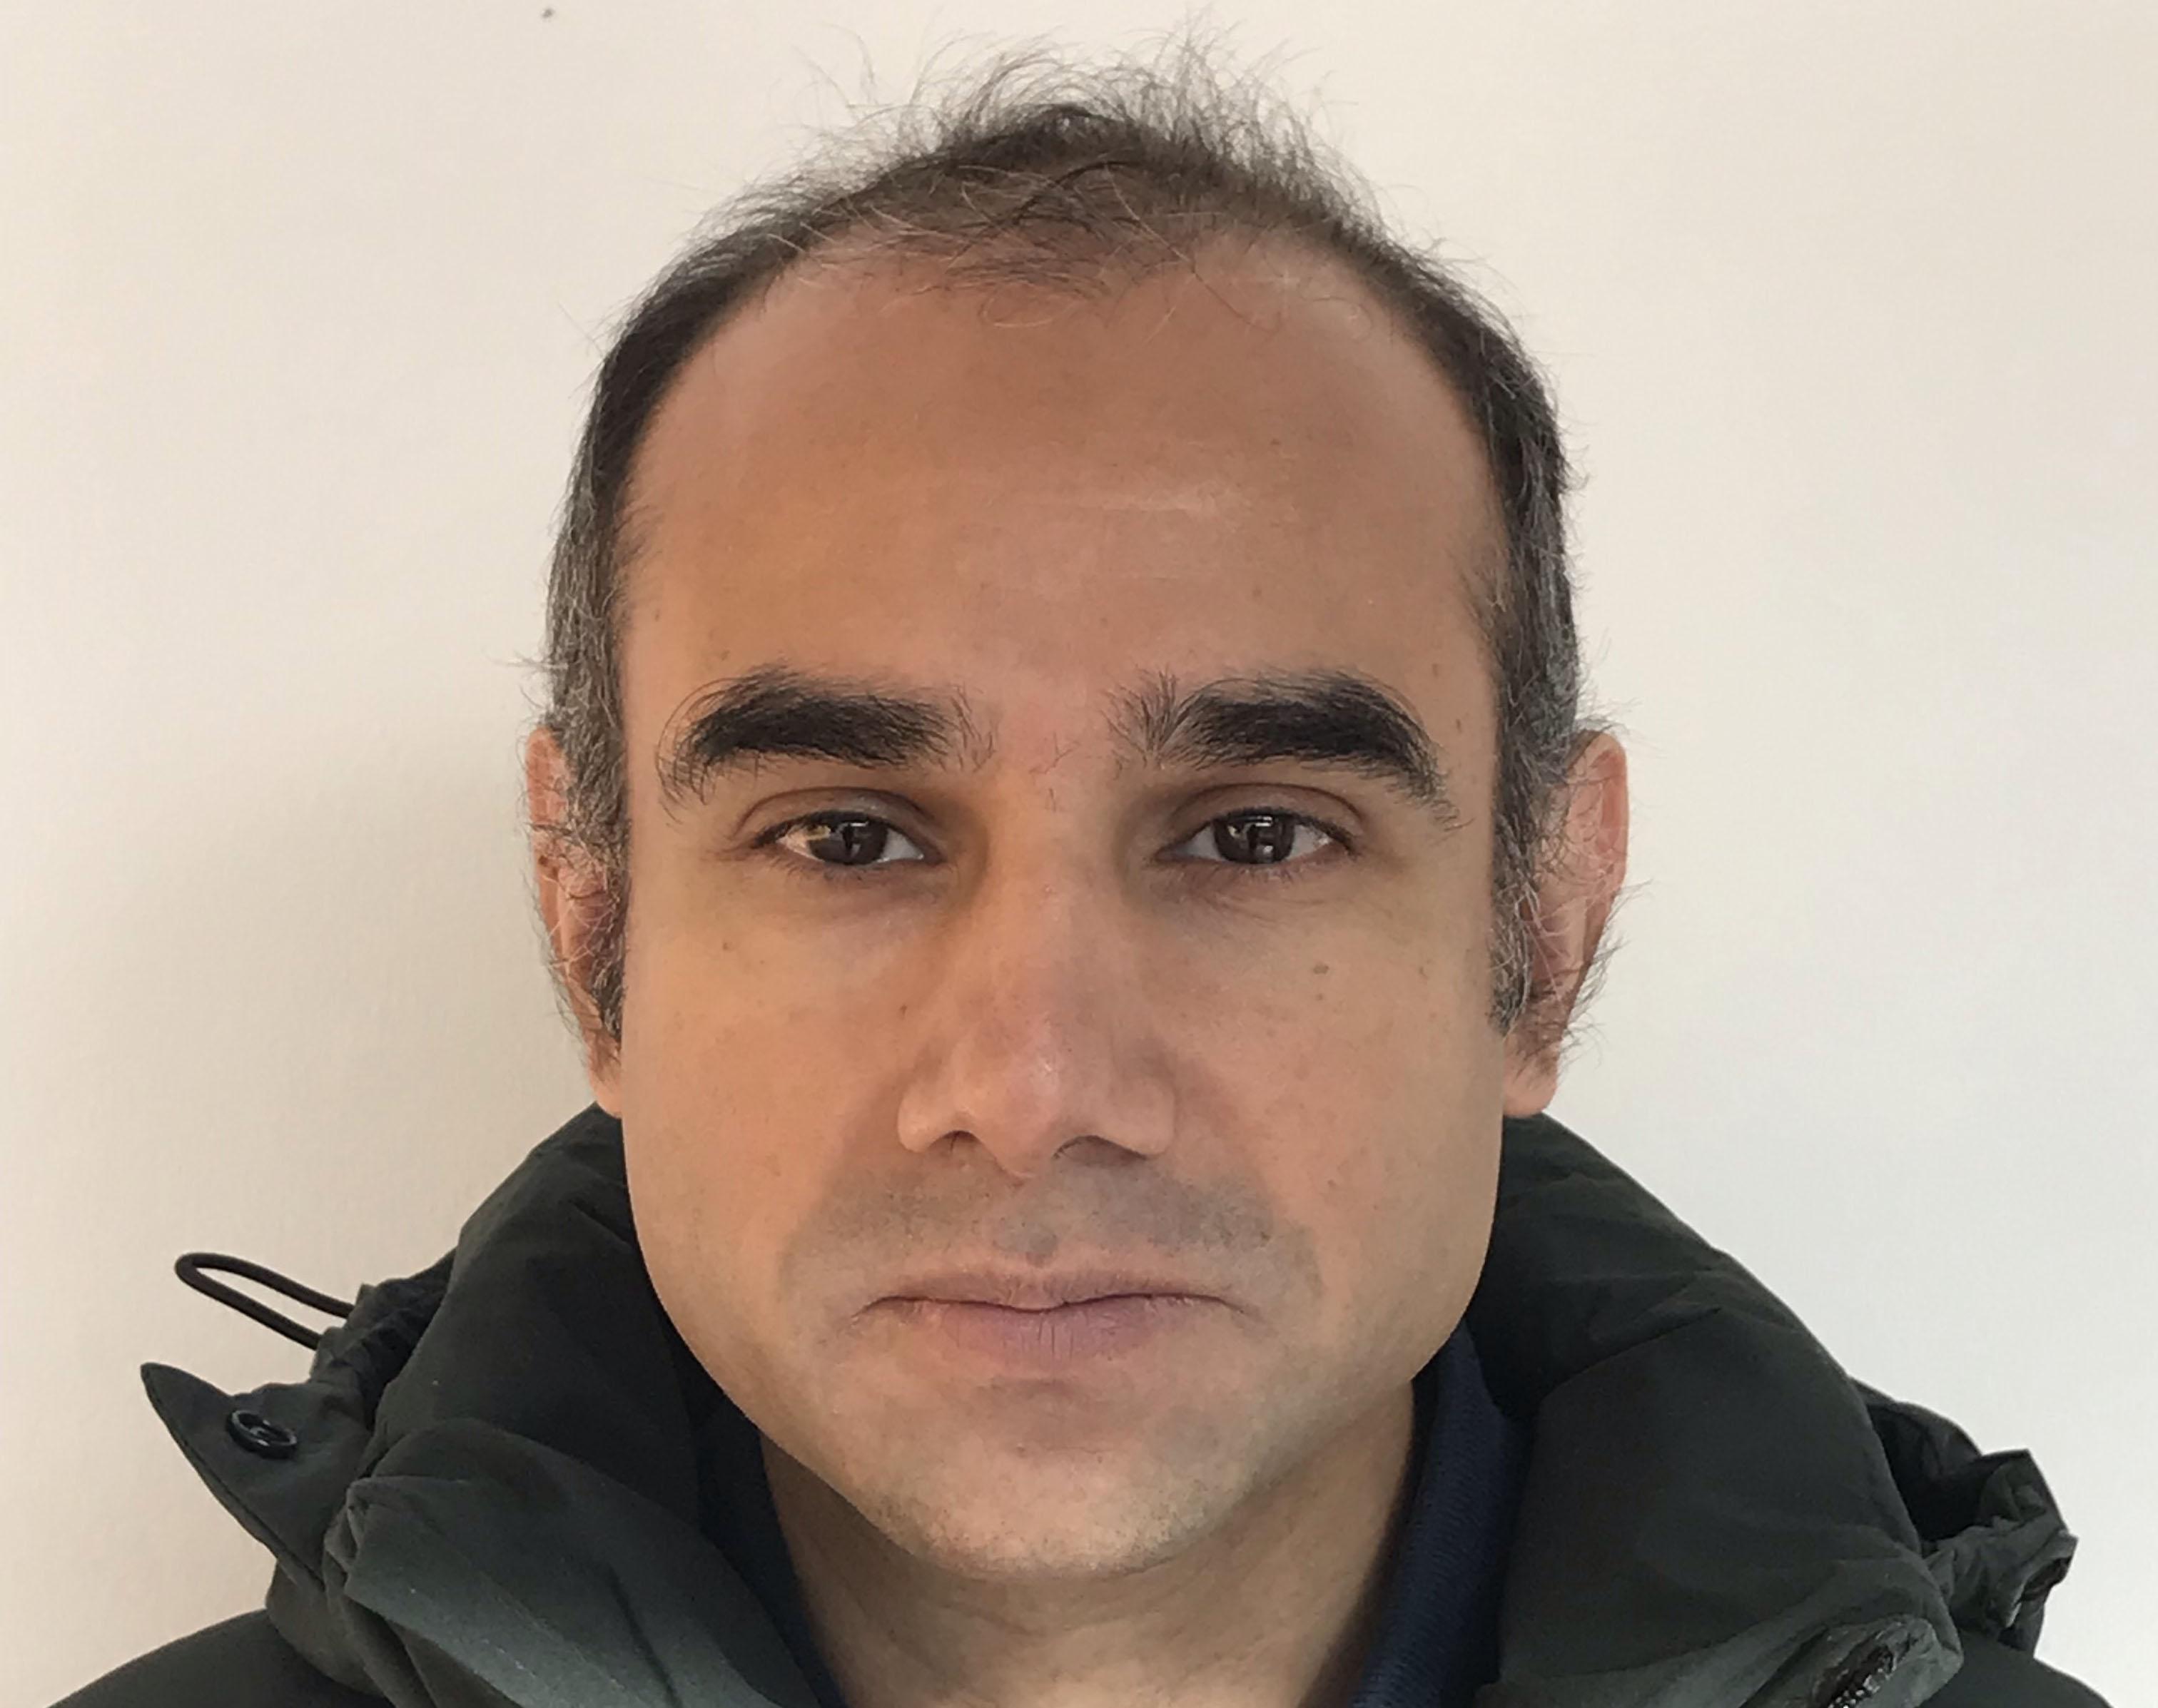 Mohammad Mehdi Hassan